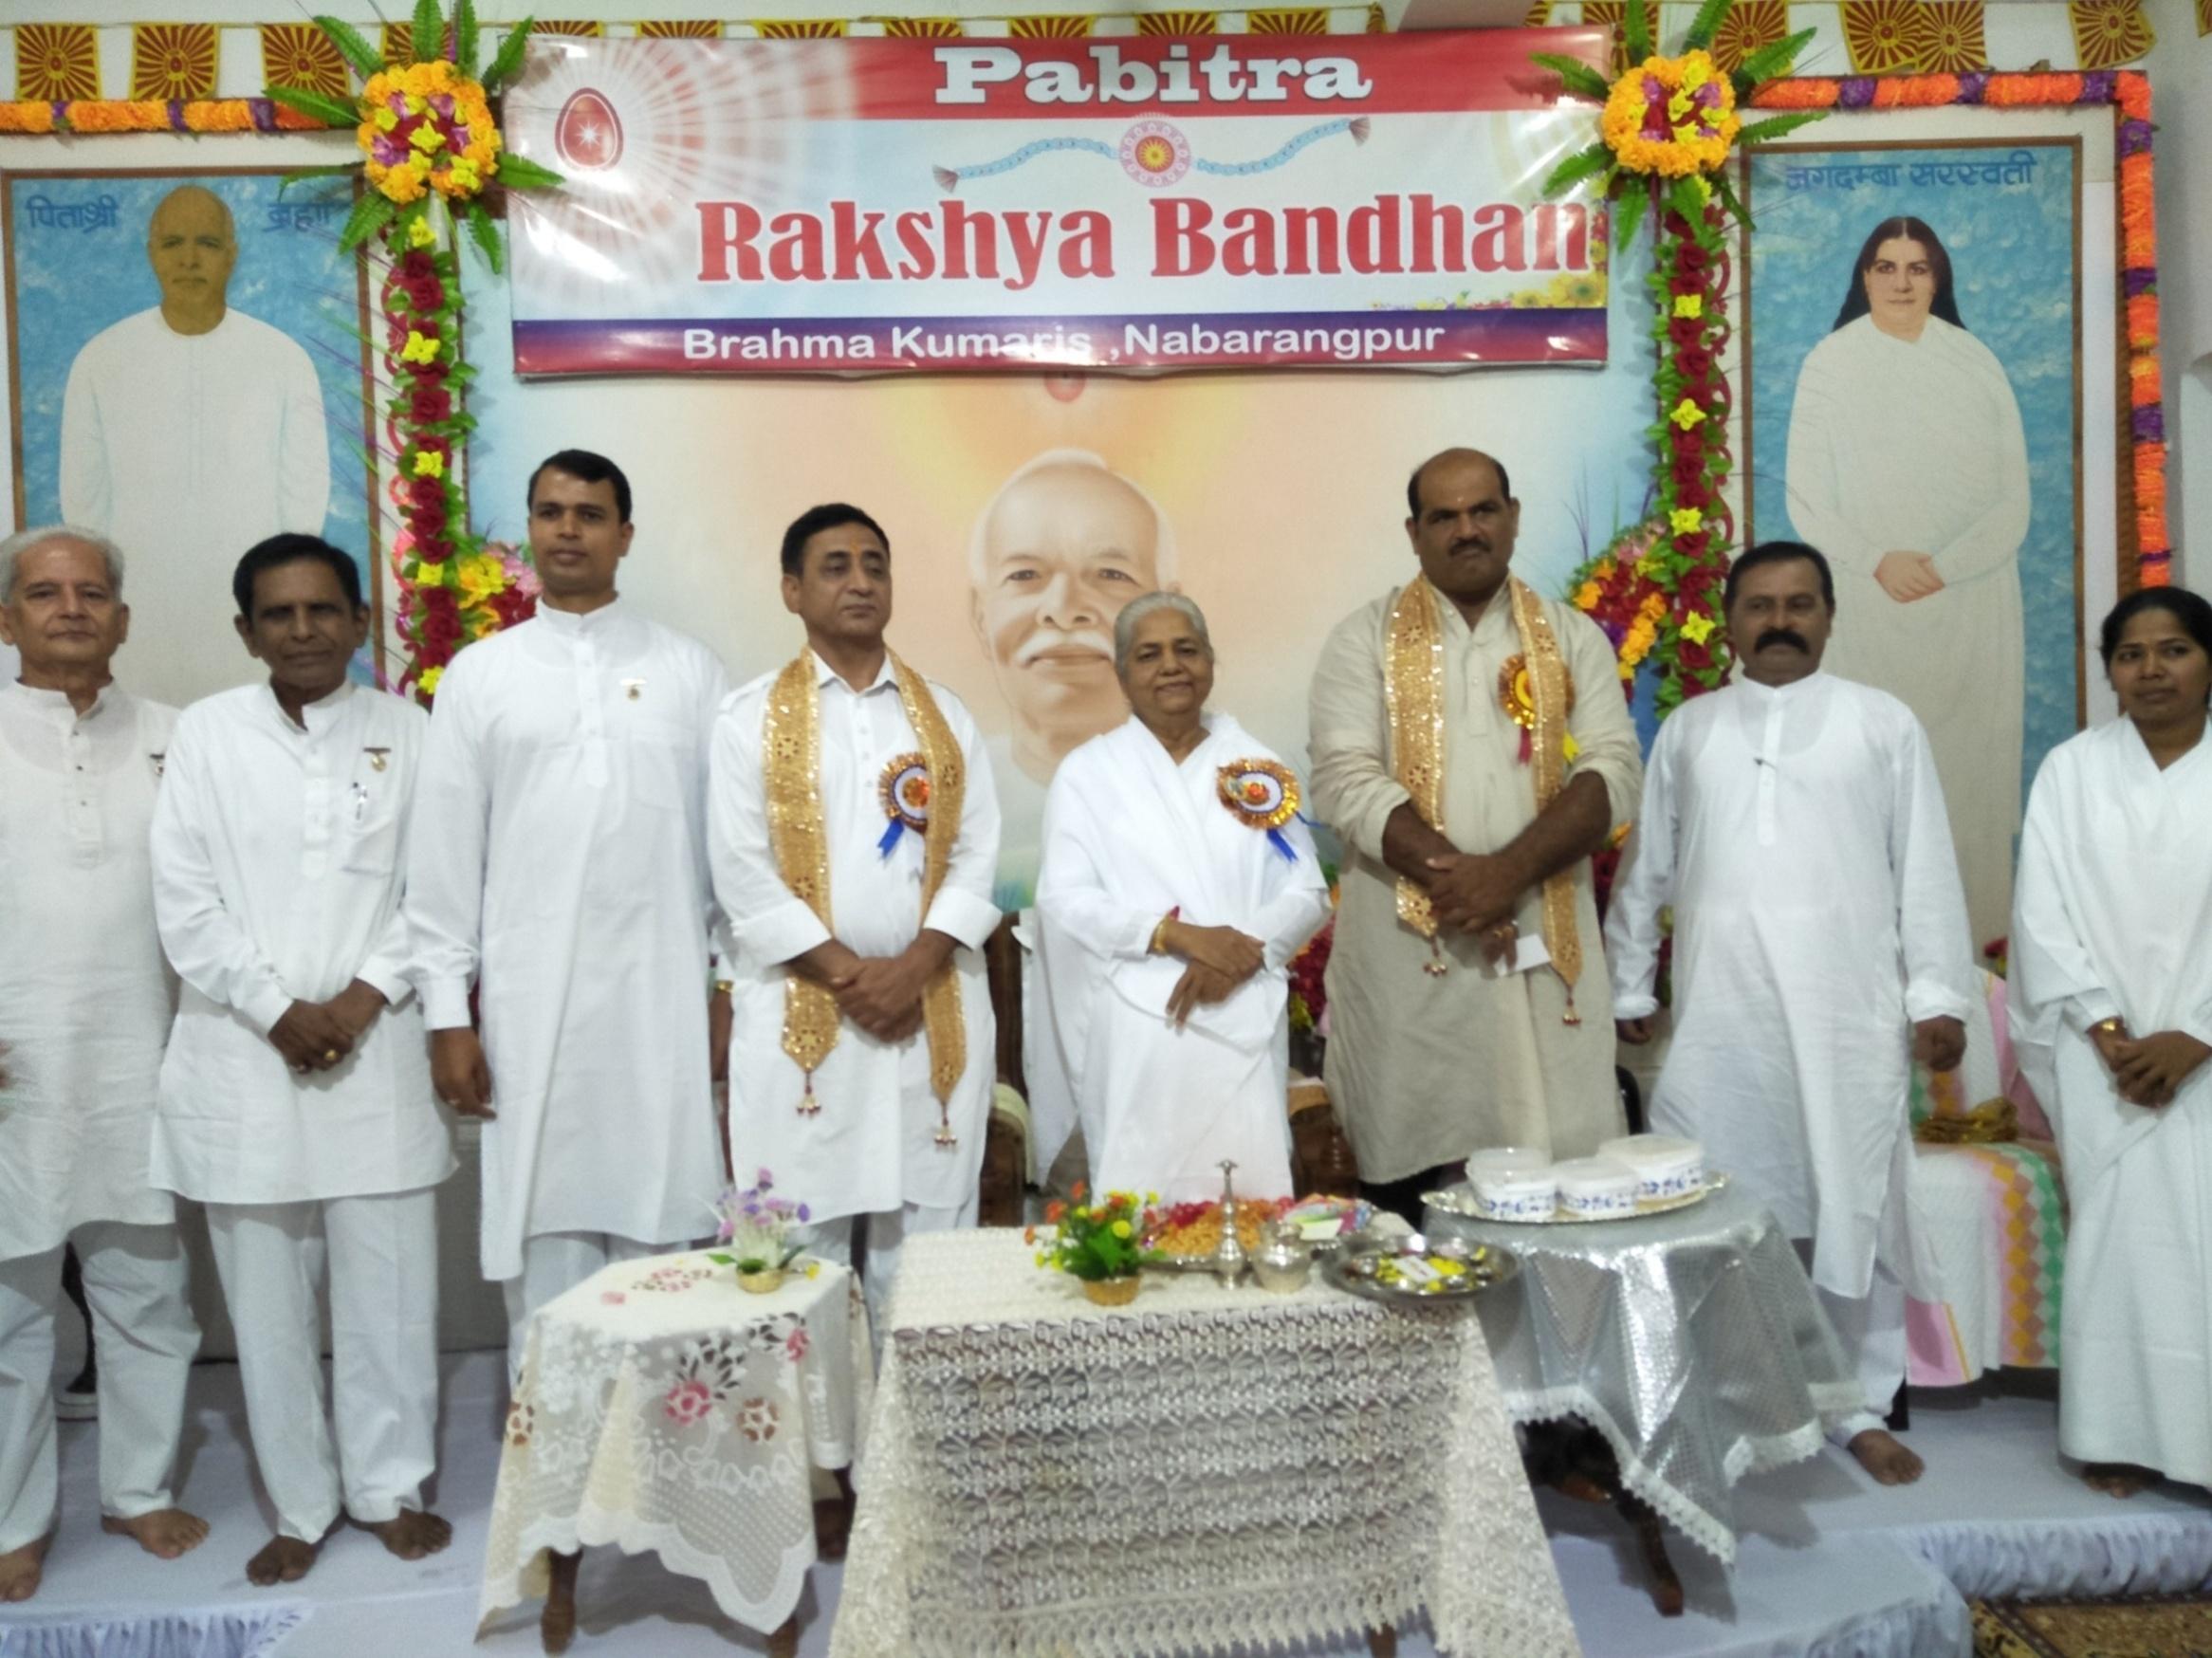 Rakshya Bandhan Nabarangpur